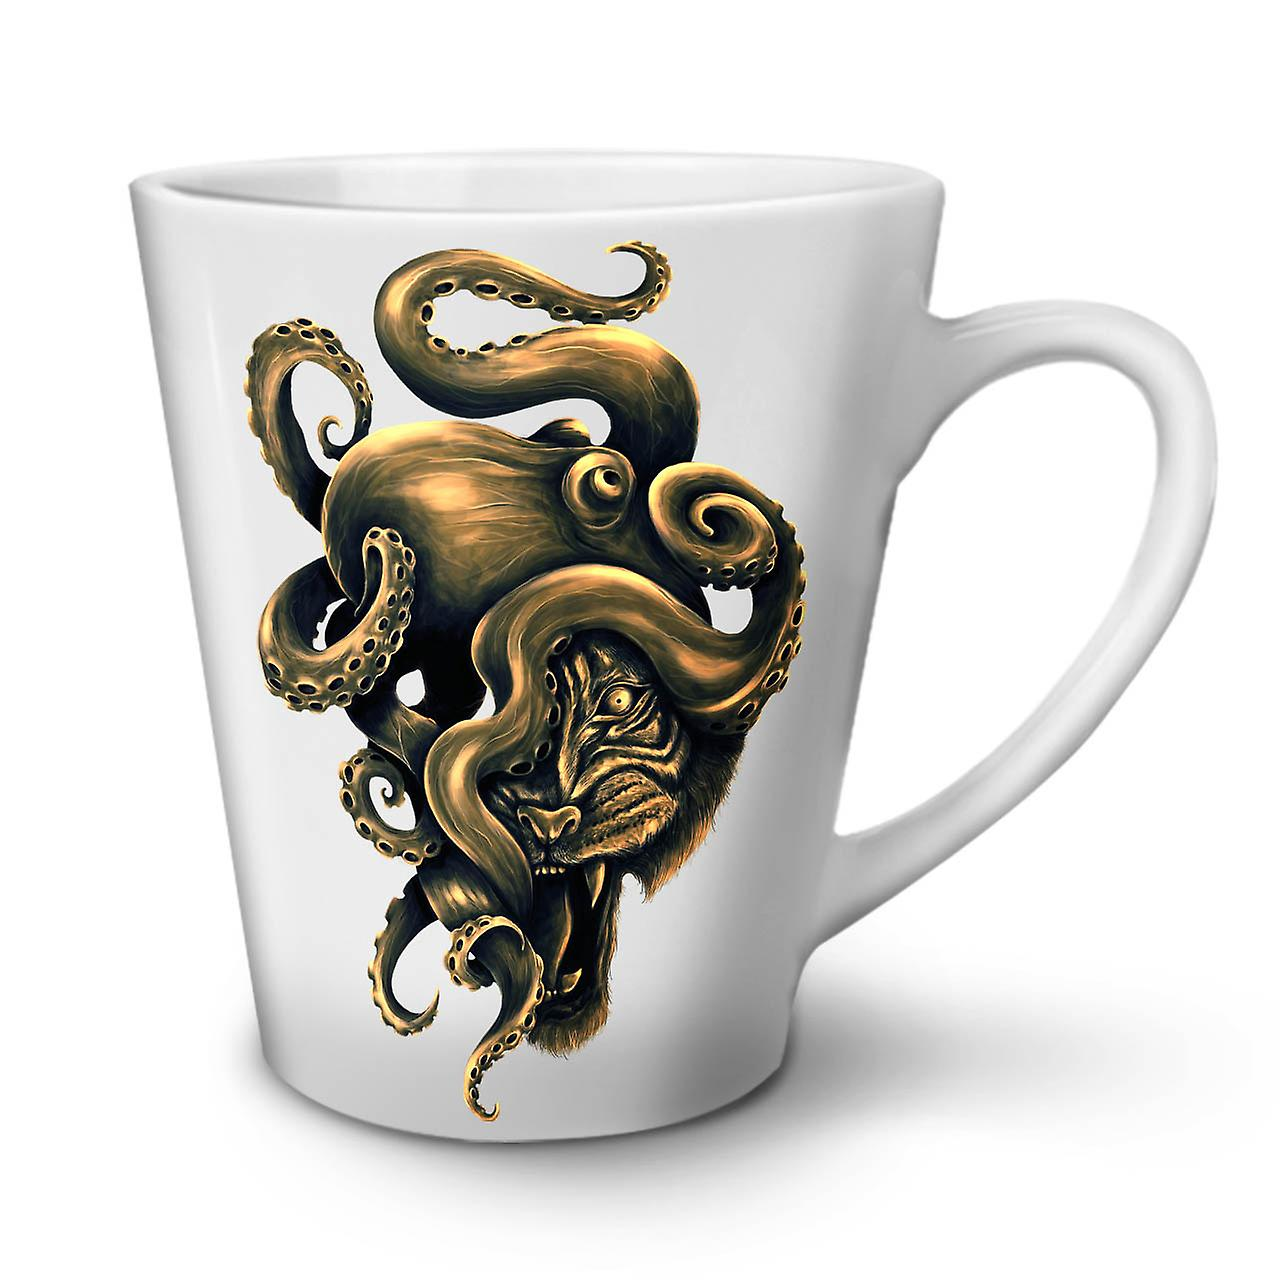 Tasse Céramique Poulpe OzWellcoda Face Latte Nouvelle Animal En Tiger 12 Blanche Café sxtQrhdC